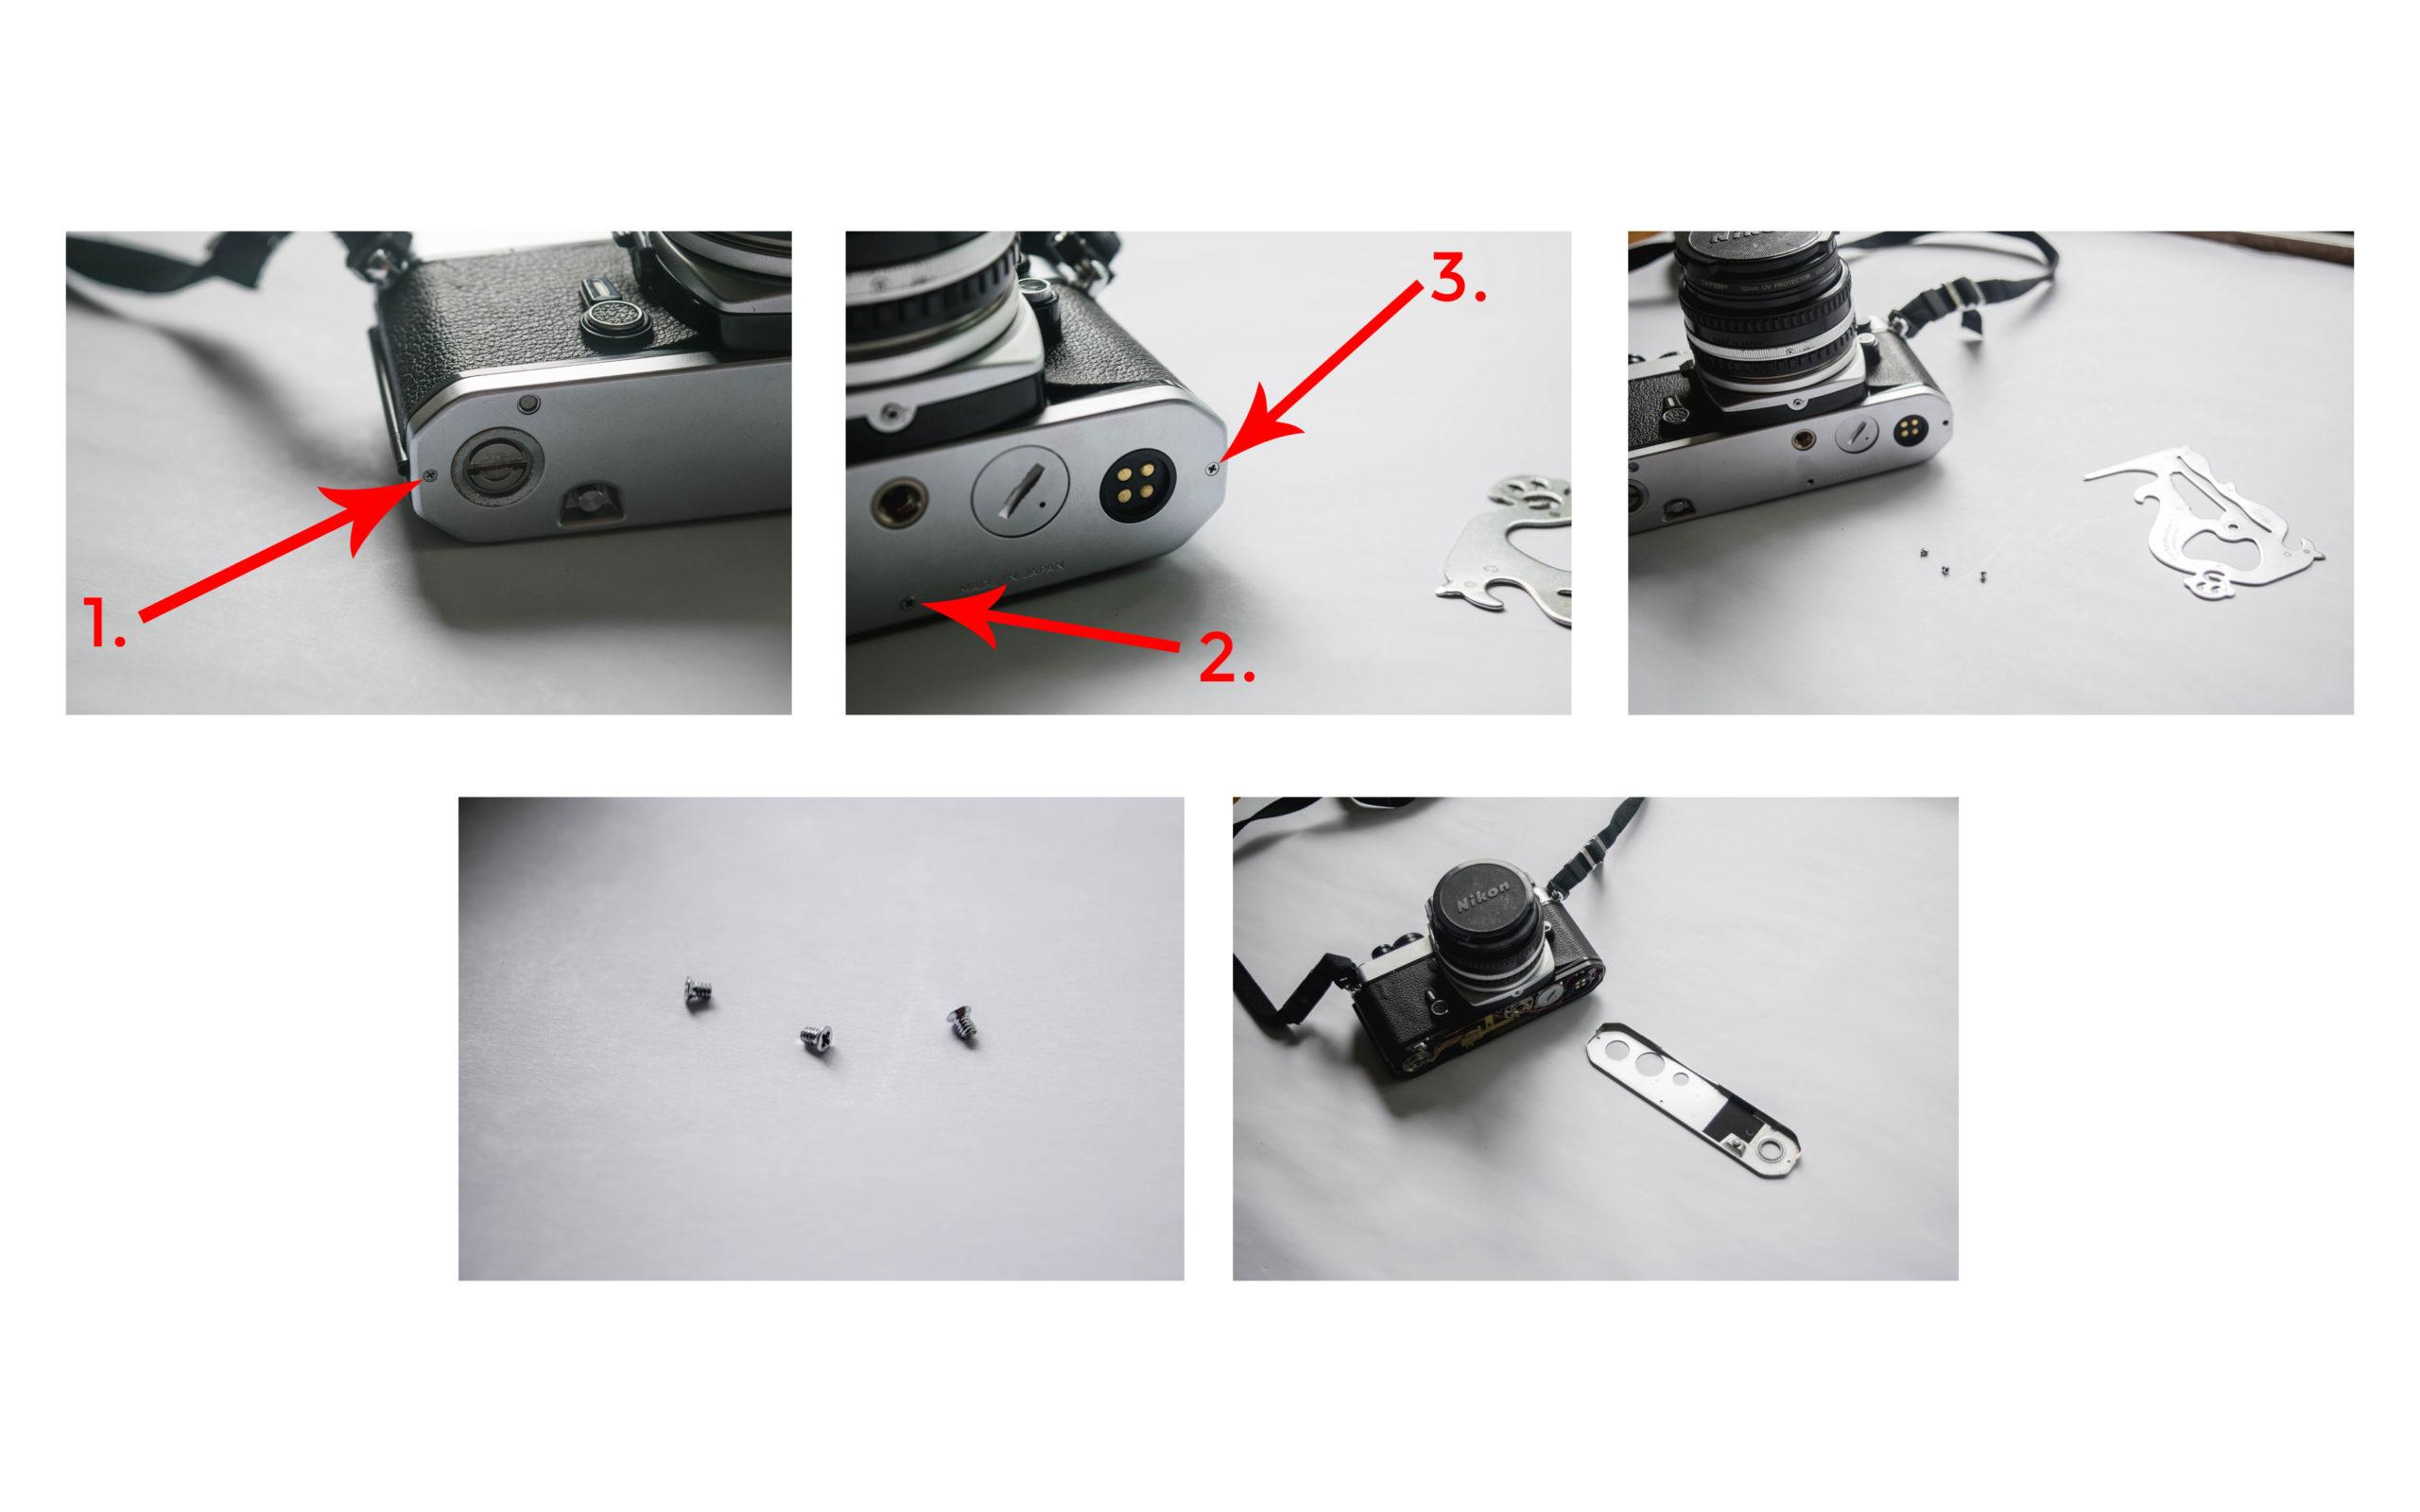 Three Screws - How to Fix a Nikon FE Film Camera with a Jammed Shutter - FilterGrade Blog